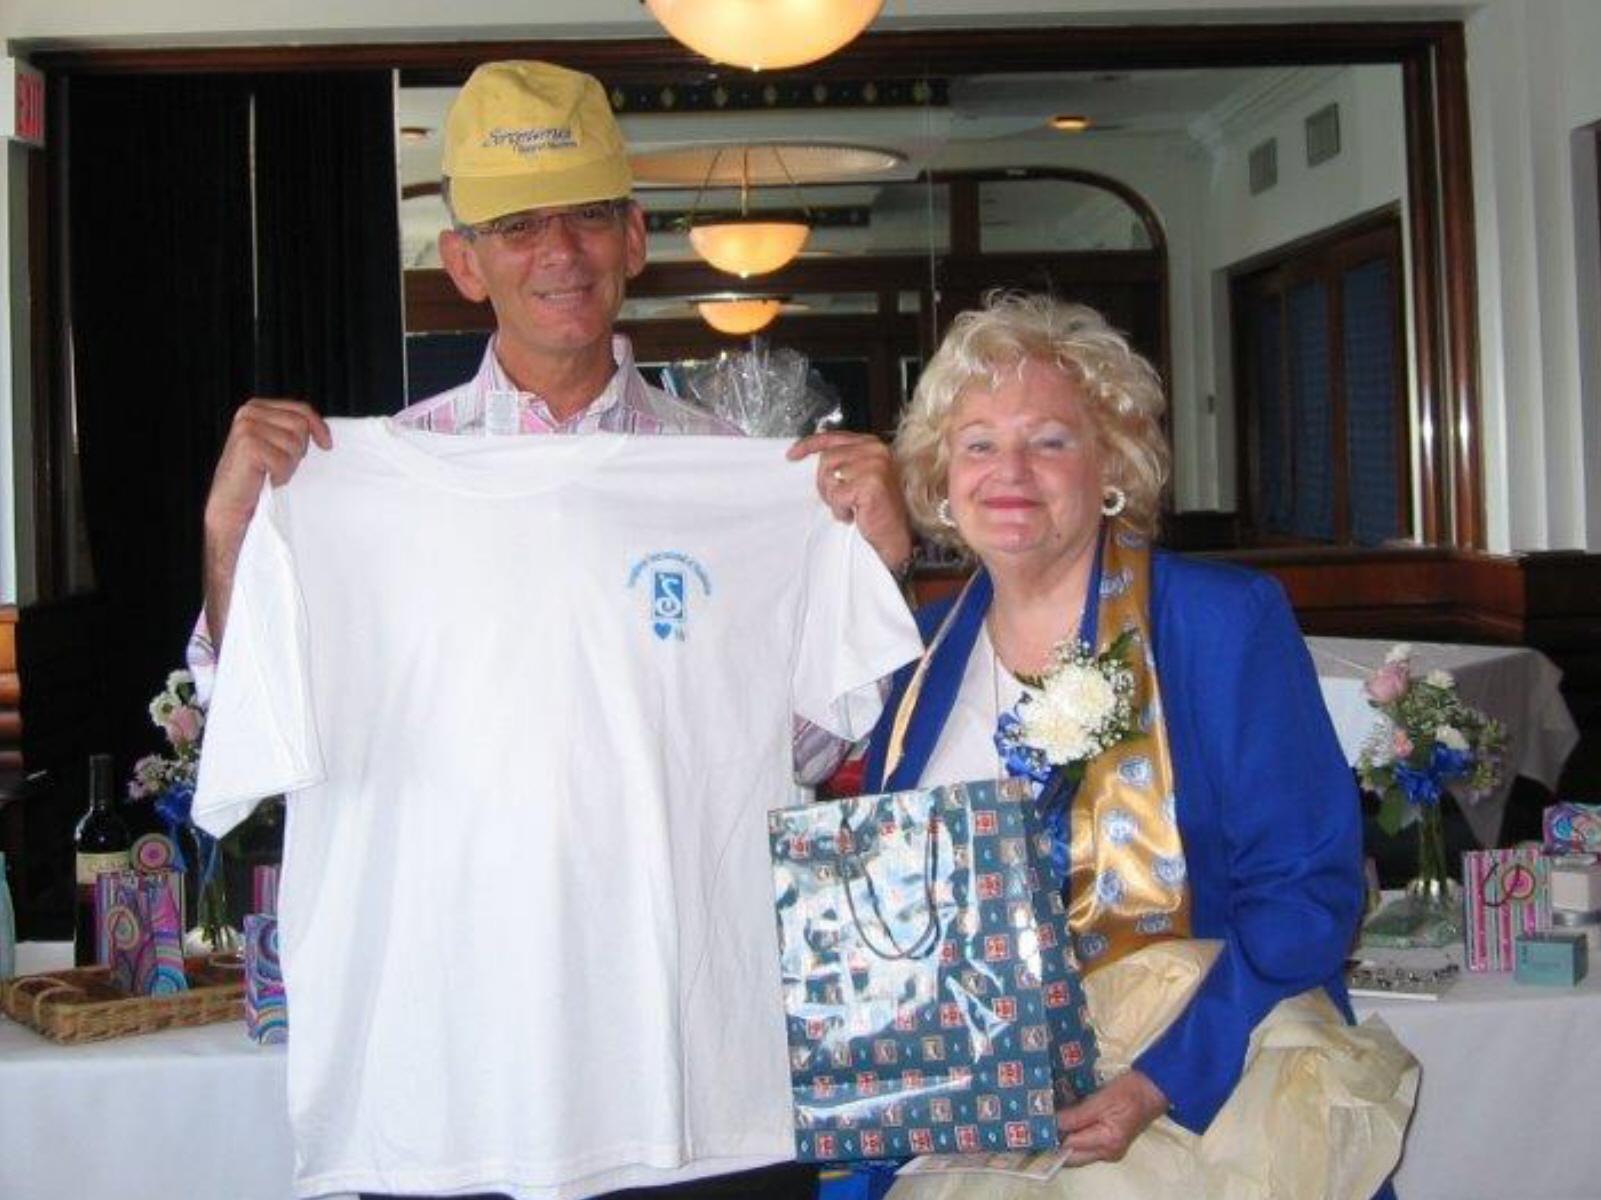 Community Service Awards Luncheon 6-10-06 Marty Barrett, Dee Carroll.jpg